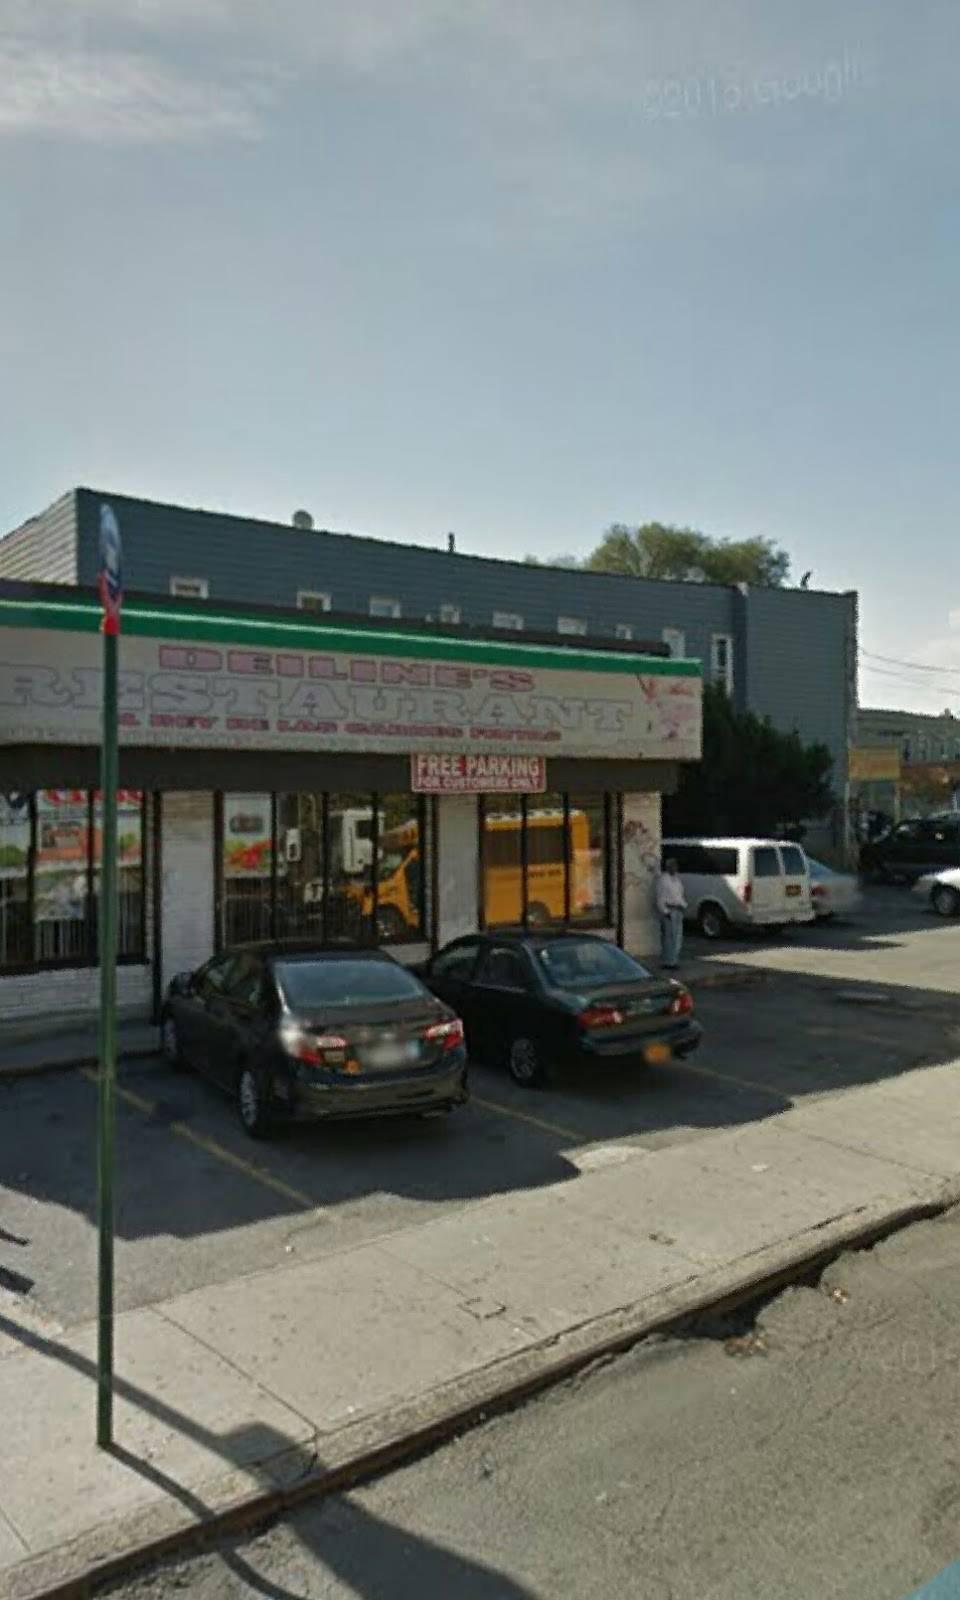 Delines | restaurant | 1544 E 174th St, Bronx, NY 10472, USA | 7183284523 OR +1 718-328-4523